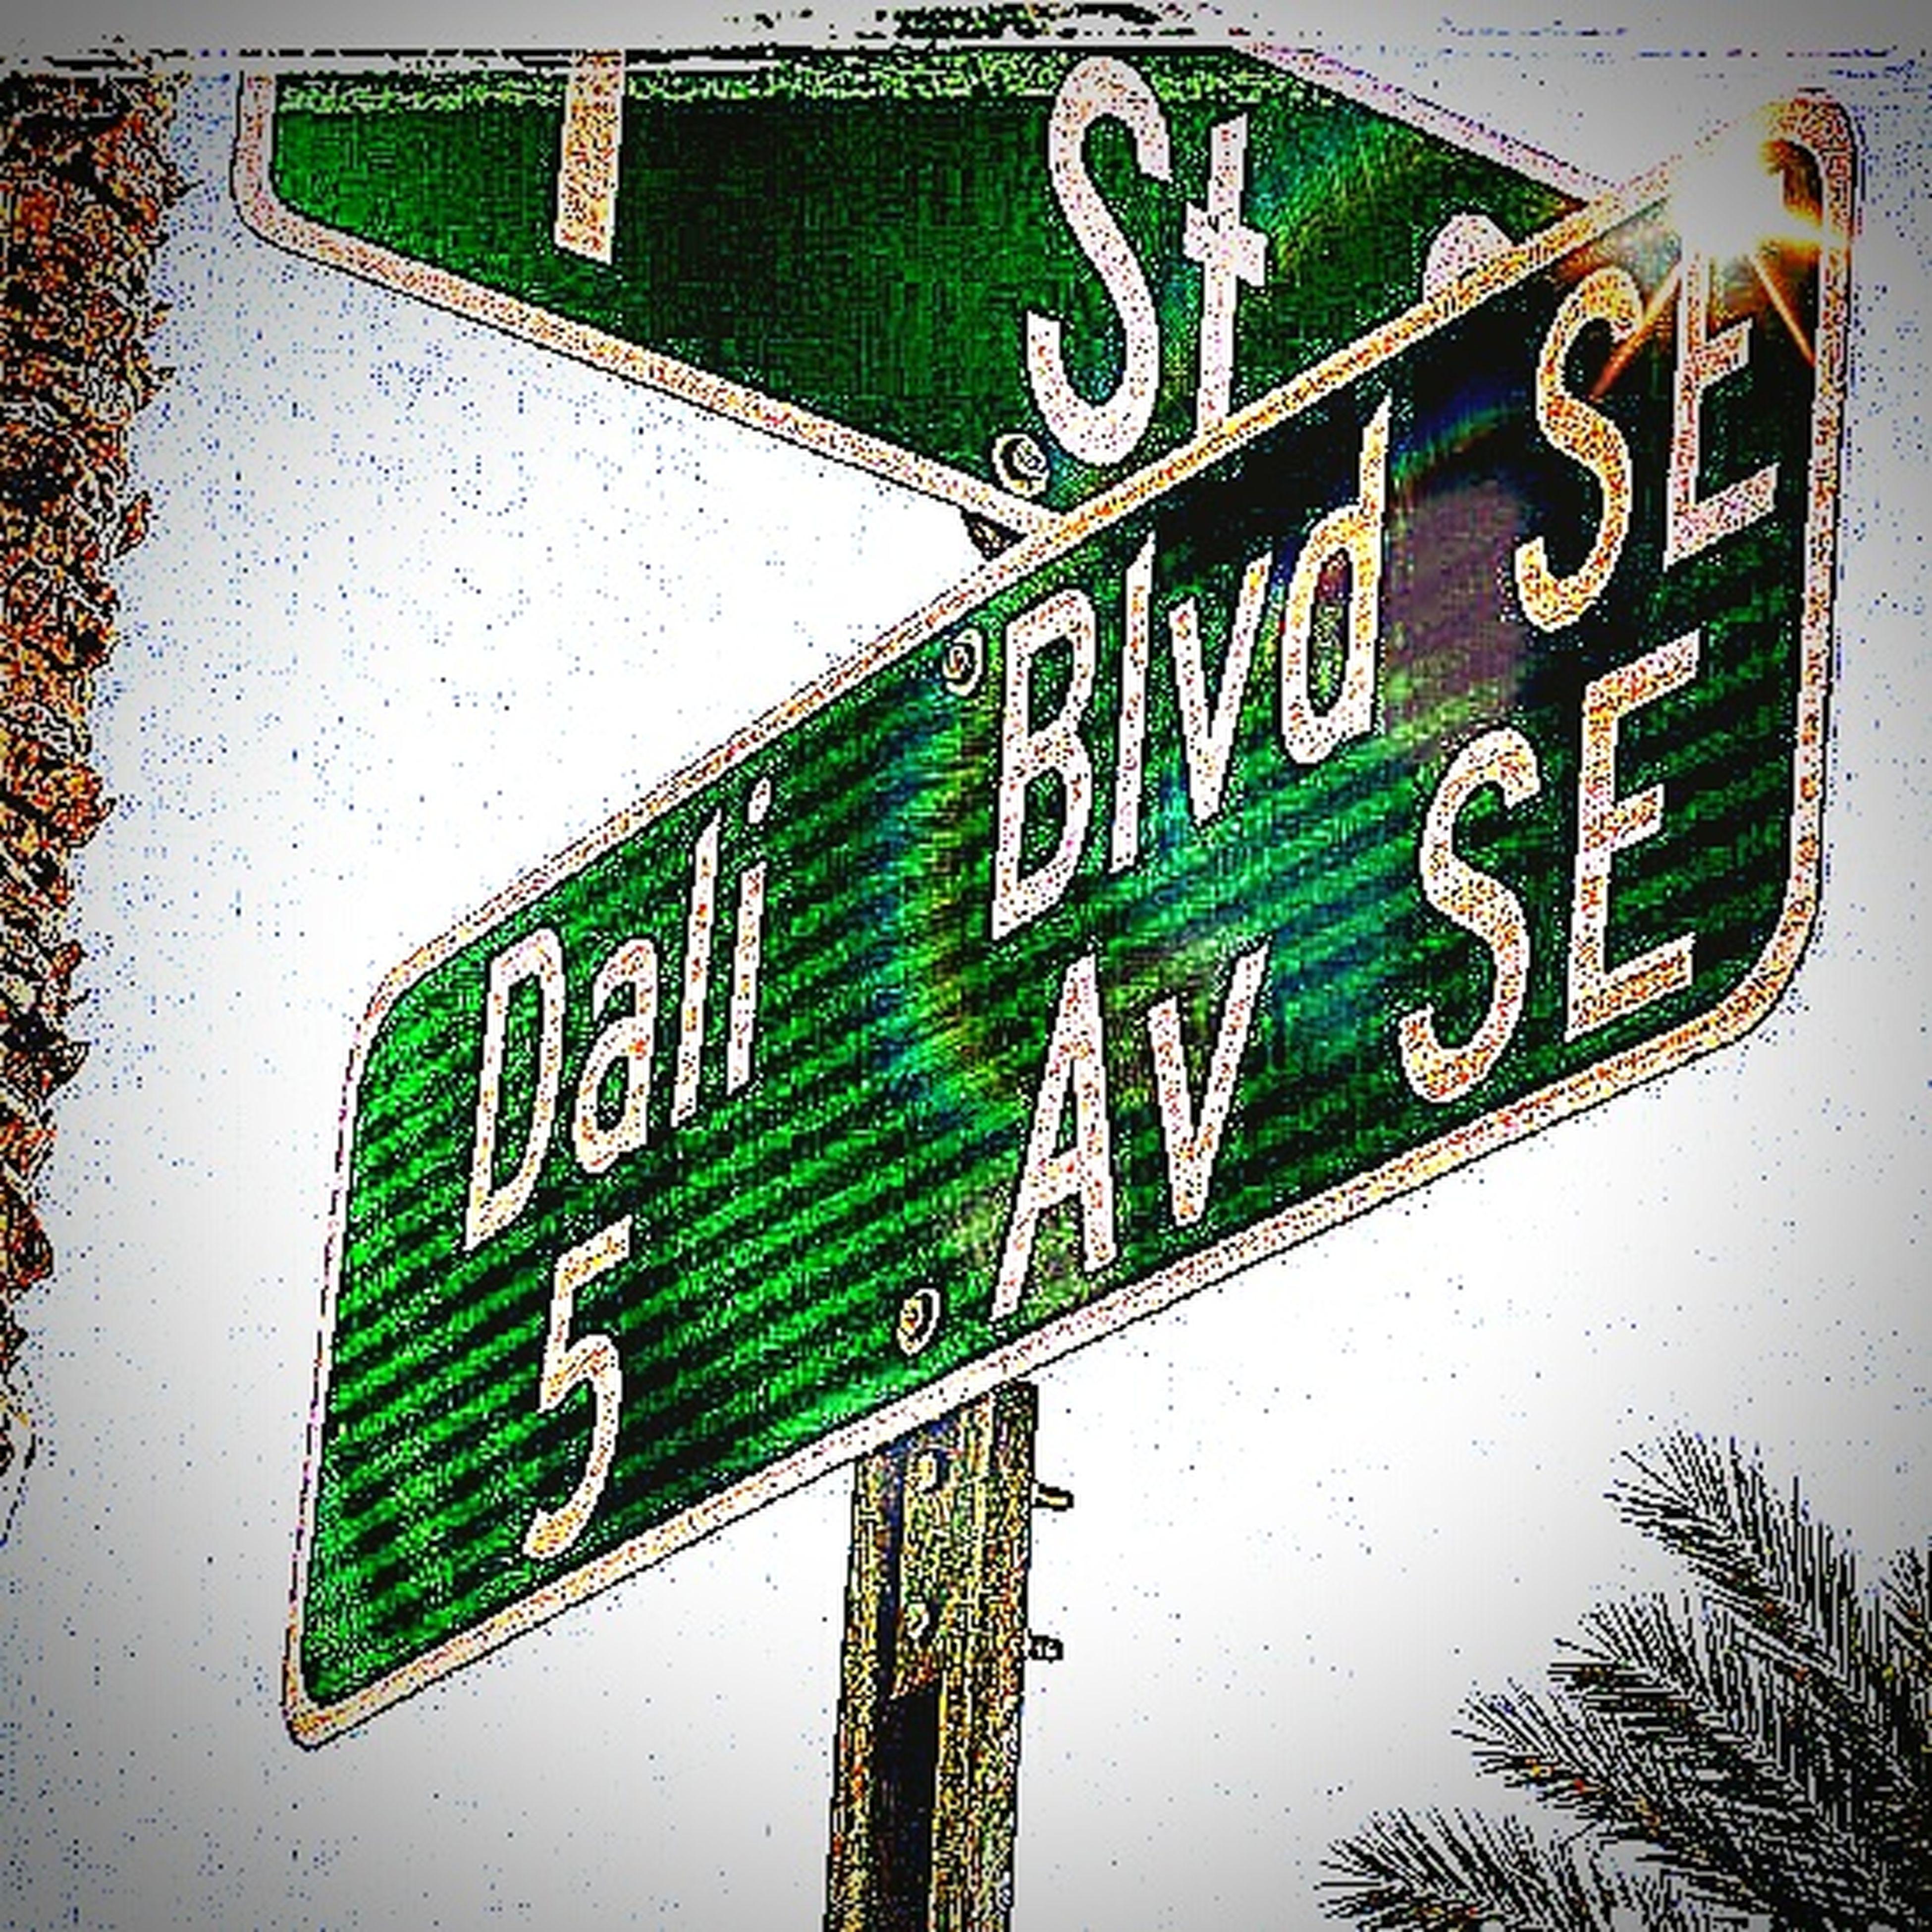 Street Art Taking Photos Street Signs Travel Photography Salvador Dali Dali Museum Floridalivin Floridasky Vacation Art